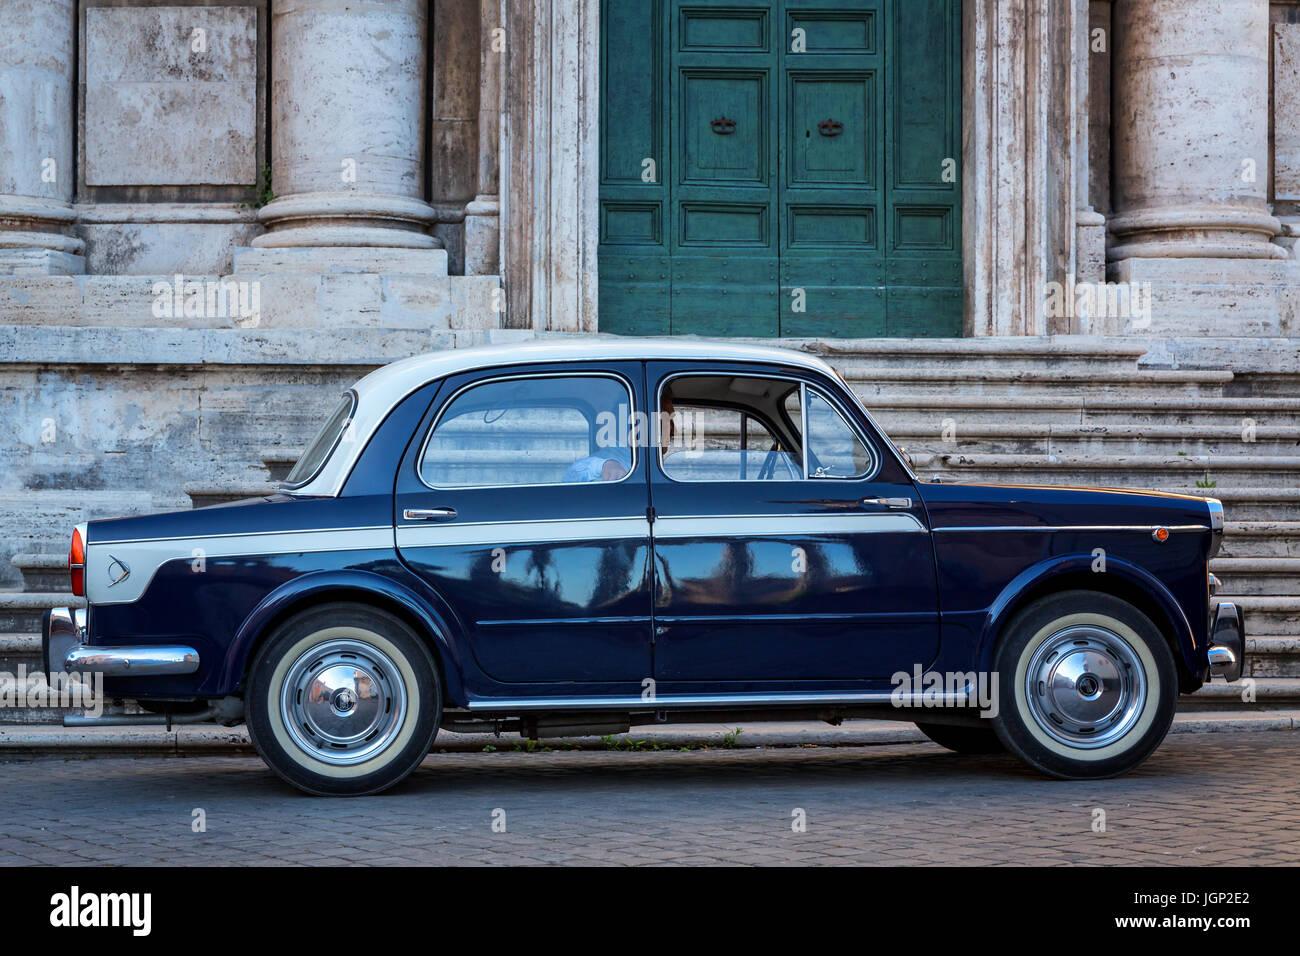 Vintage Fiat 1100, Rome, Lazio, Italy - Stock Image